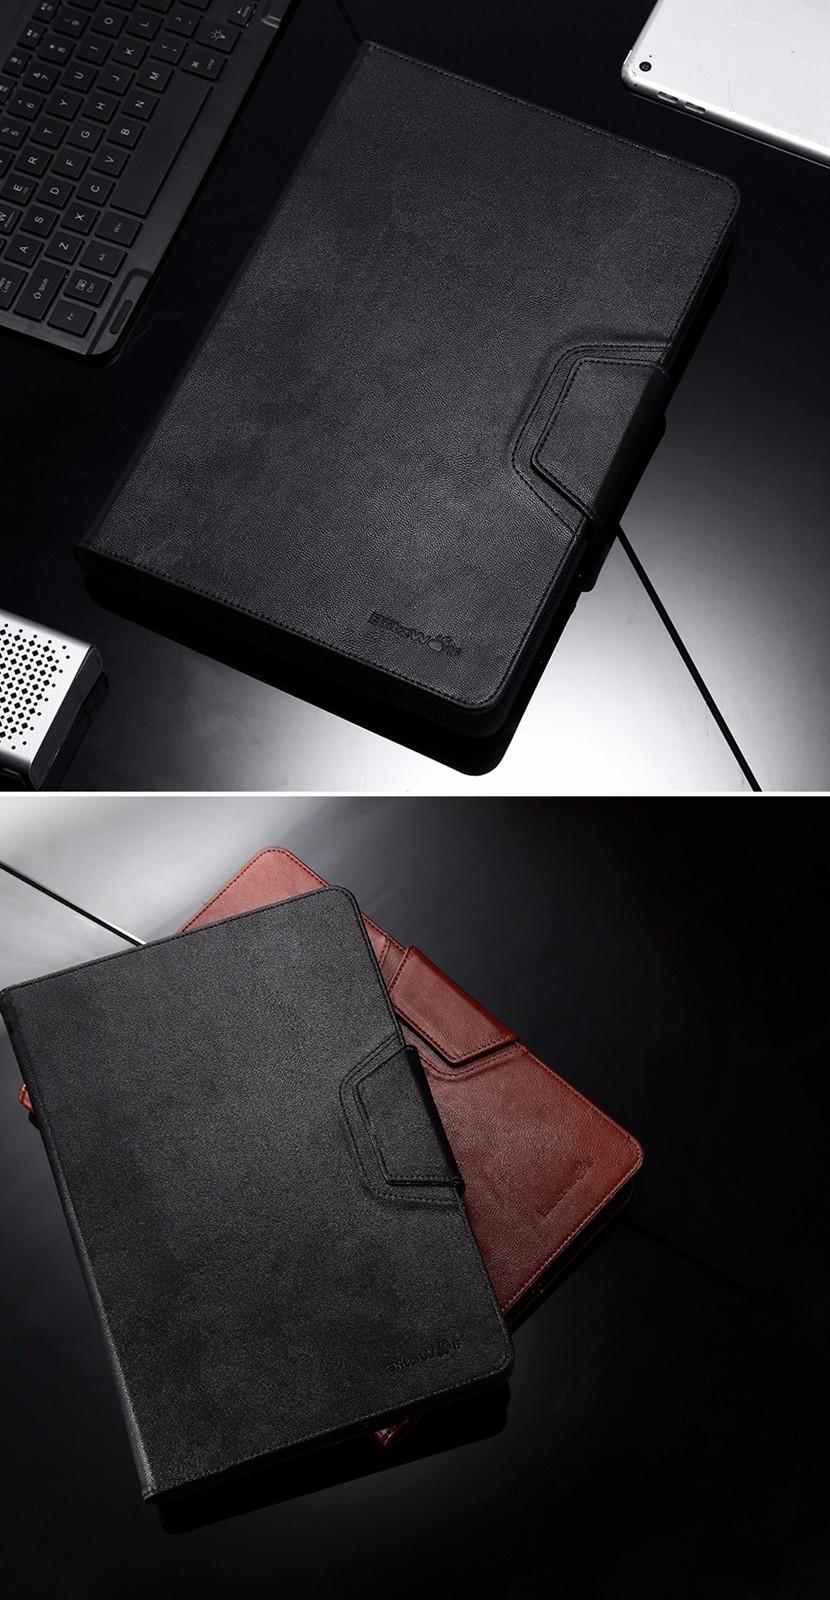 BlitzWolf® BW-KC1 Bluetooth 3.0 Backlight Keyboard PU Leather Case For iPad Mini Air Pro Samsung Galaxy Tab